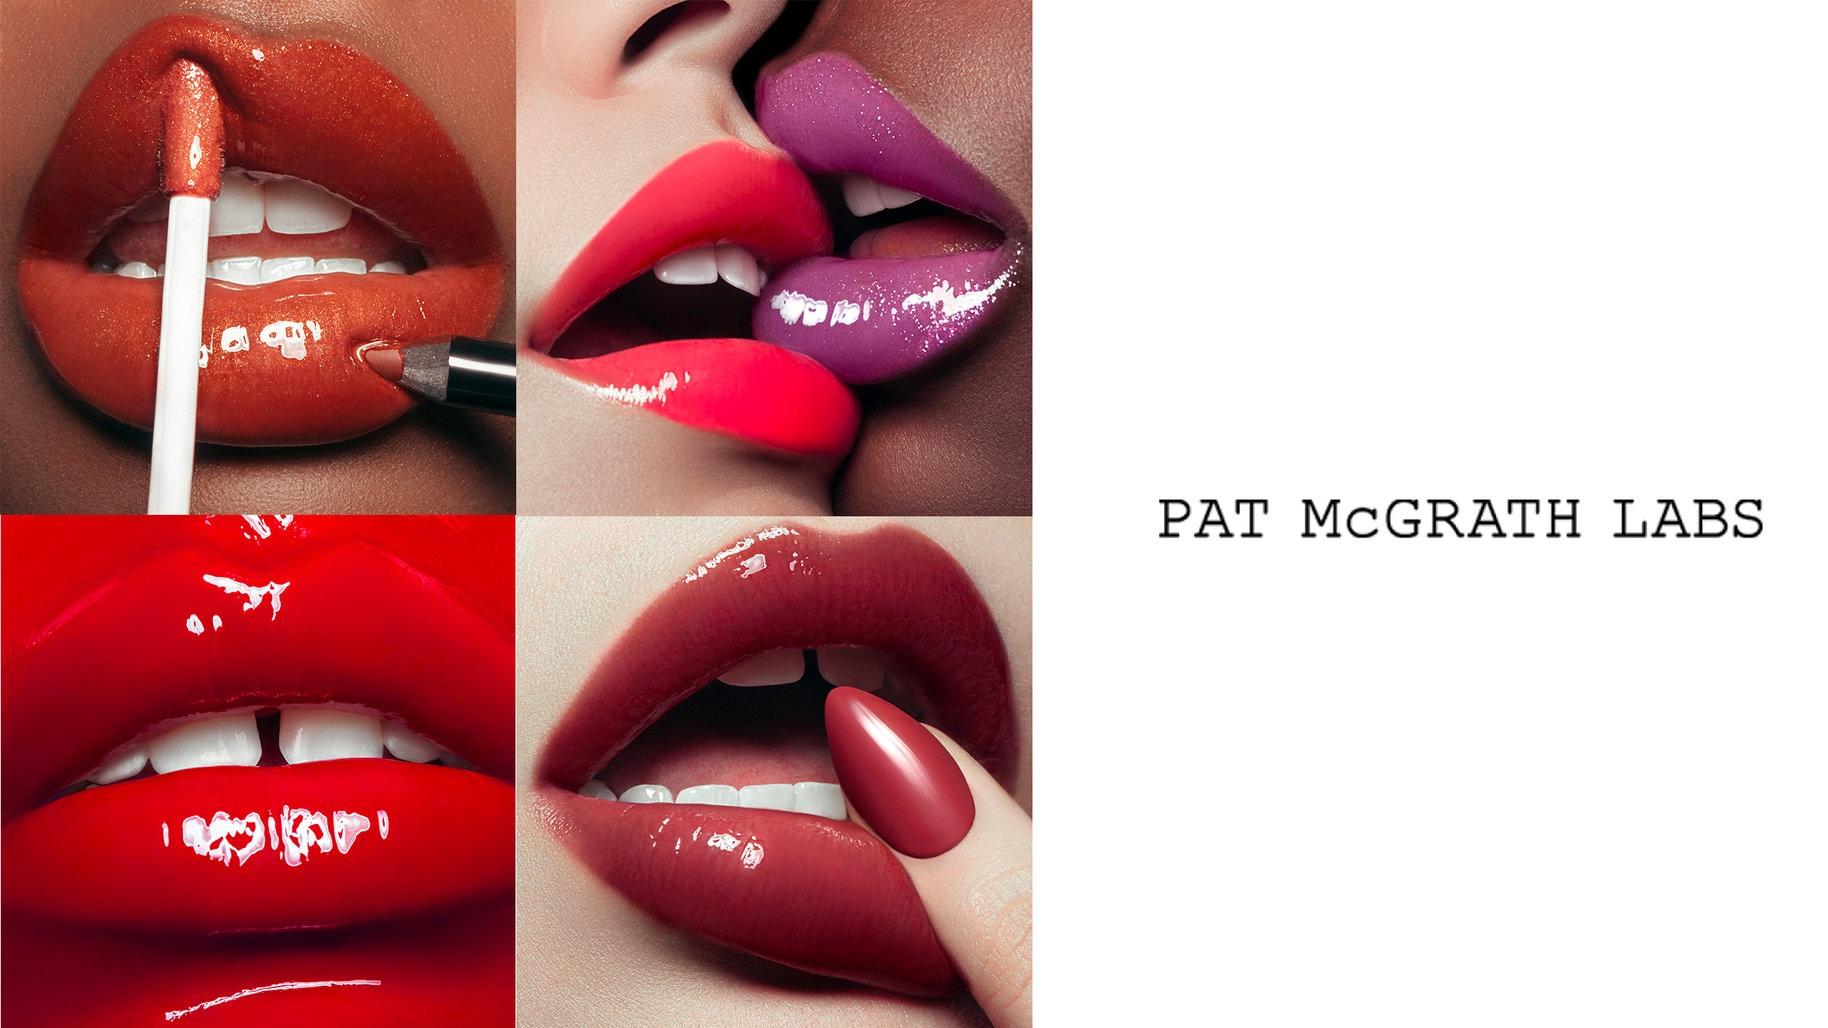 PatMcgrathbyNastia.jpg